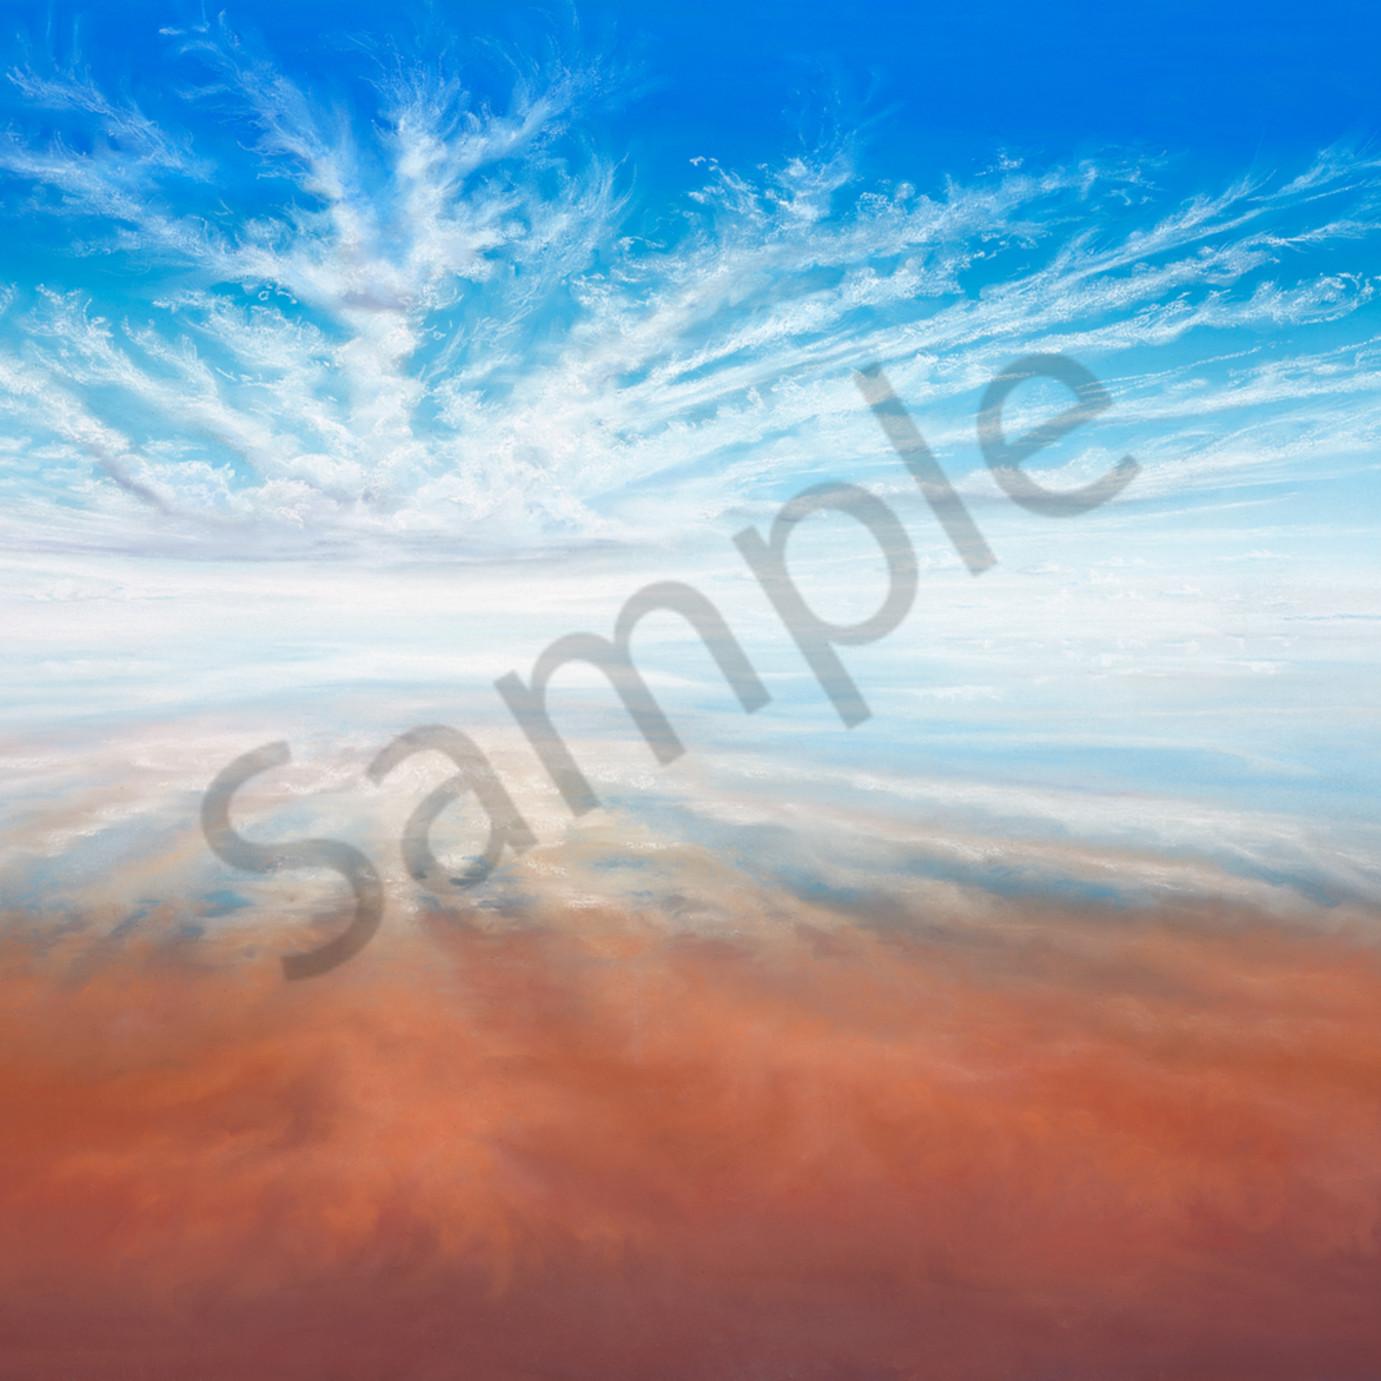 Jgre 049 lake eyre mystery 67x97cm original sqhmuk